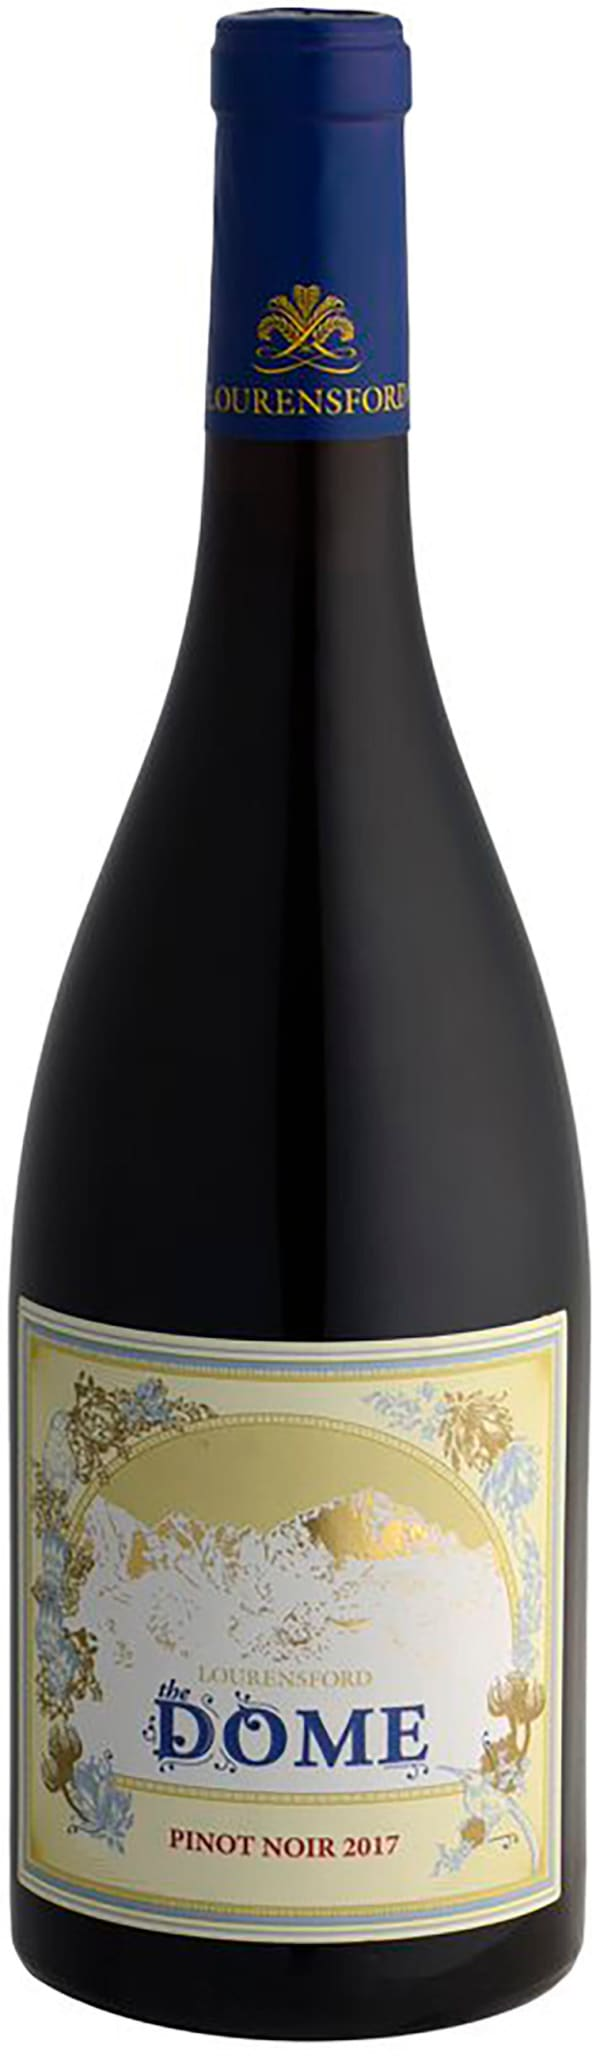 Lourensford The Dome Pinot Noir 2017